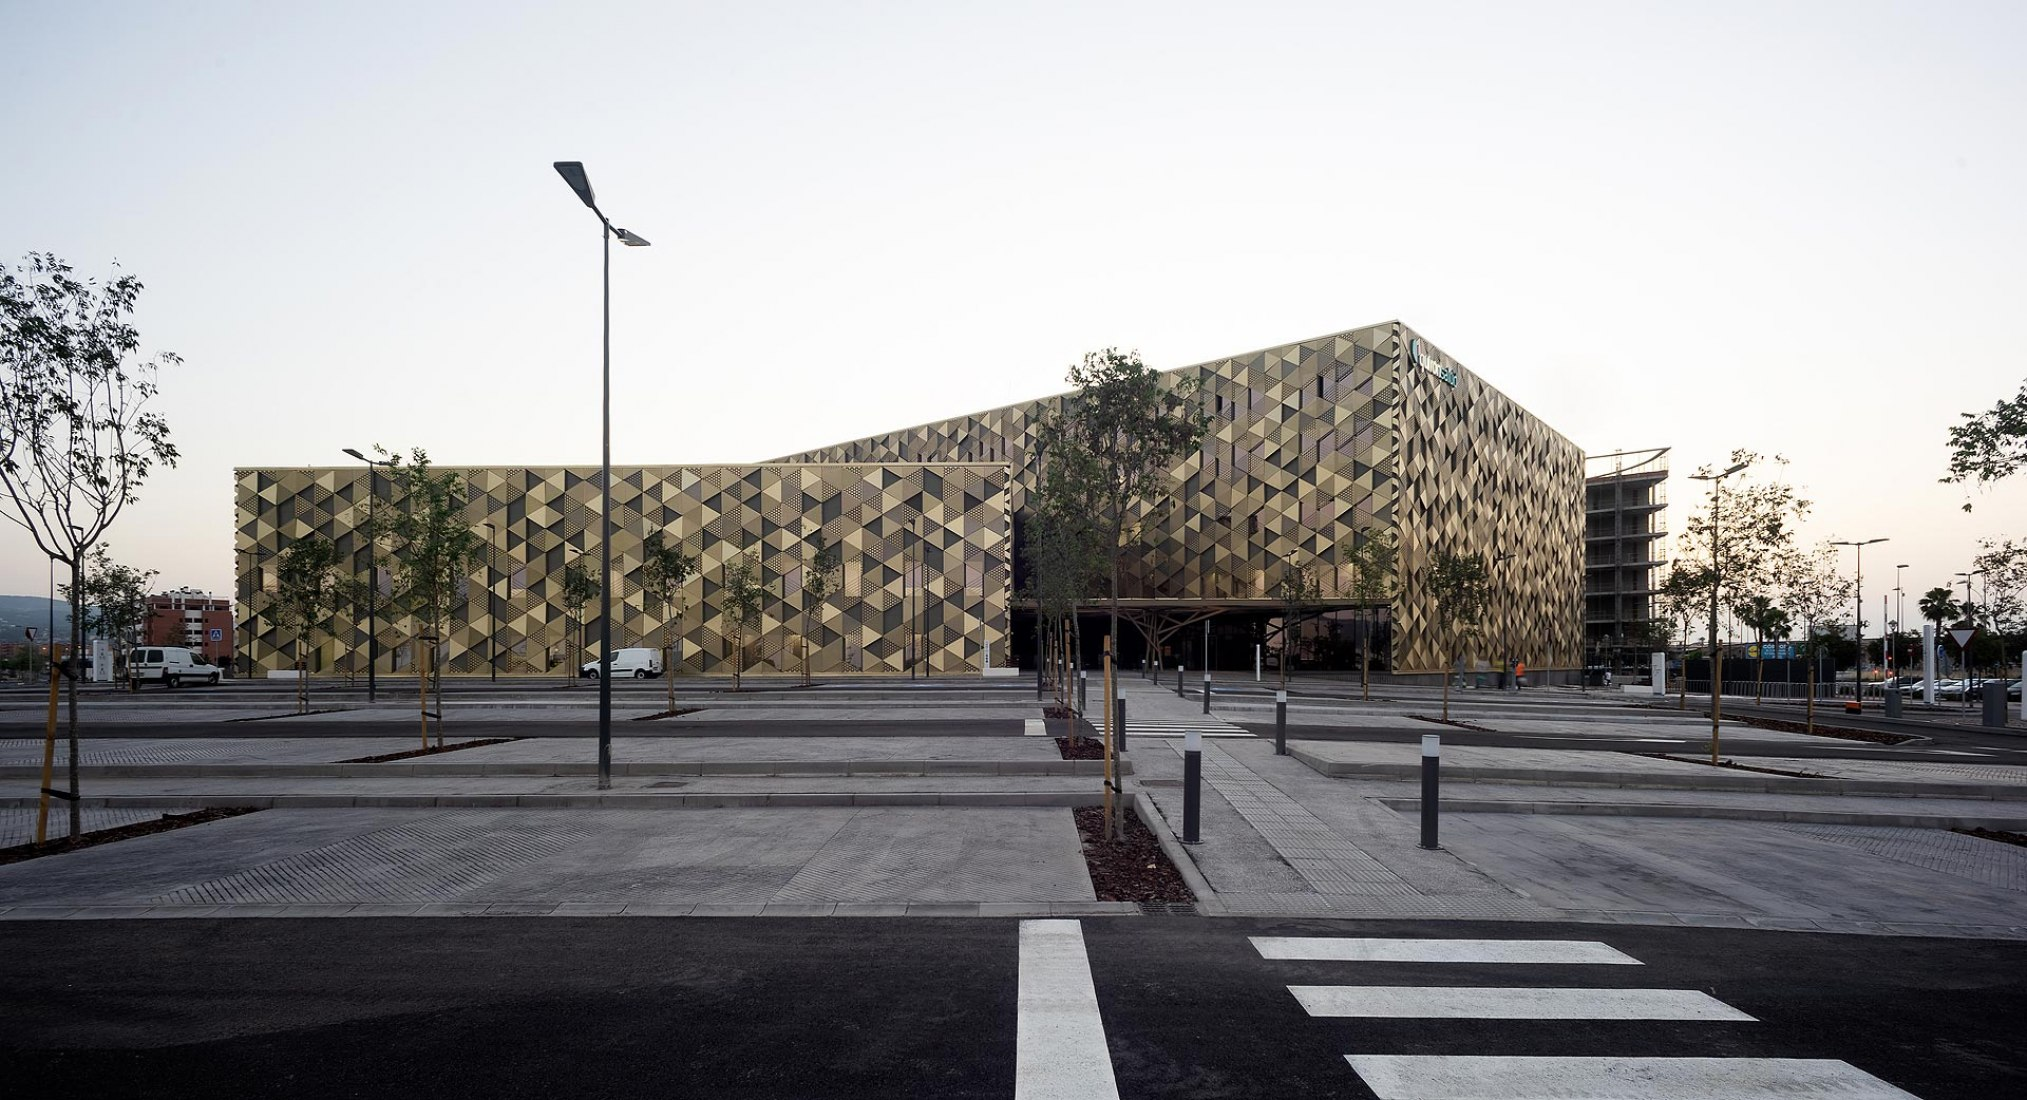 Hospital Quirónsalud Córdoba by Enero Arquitectura. Photograph by Jorge Allende.